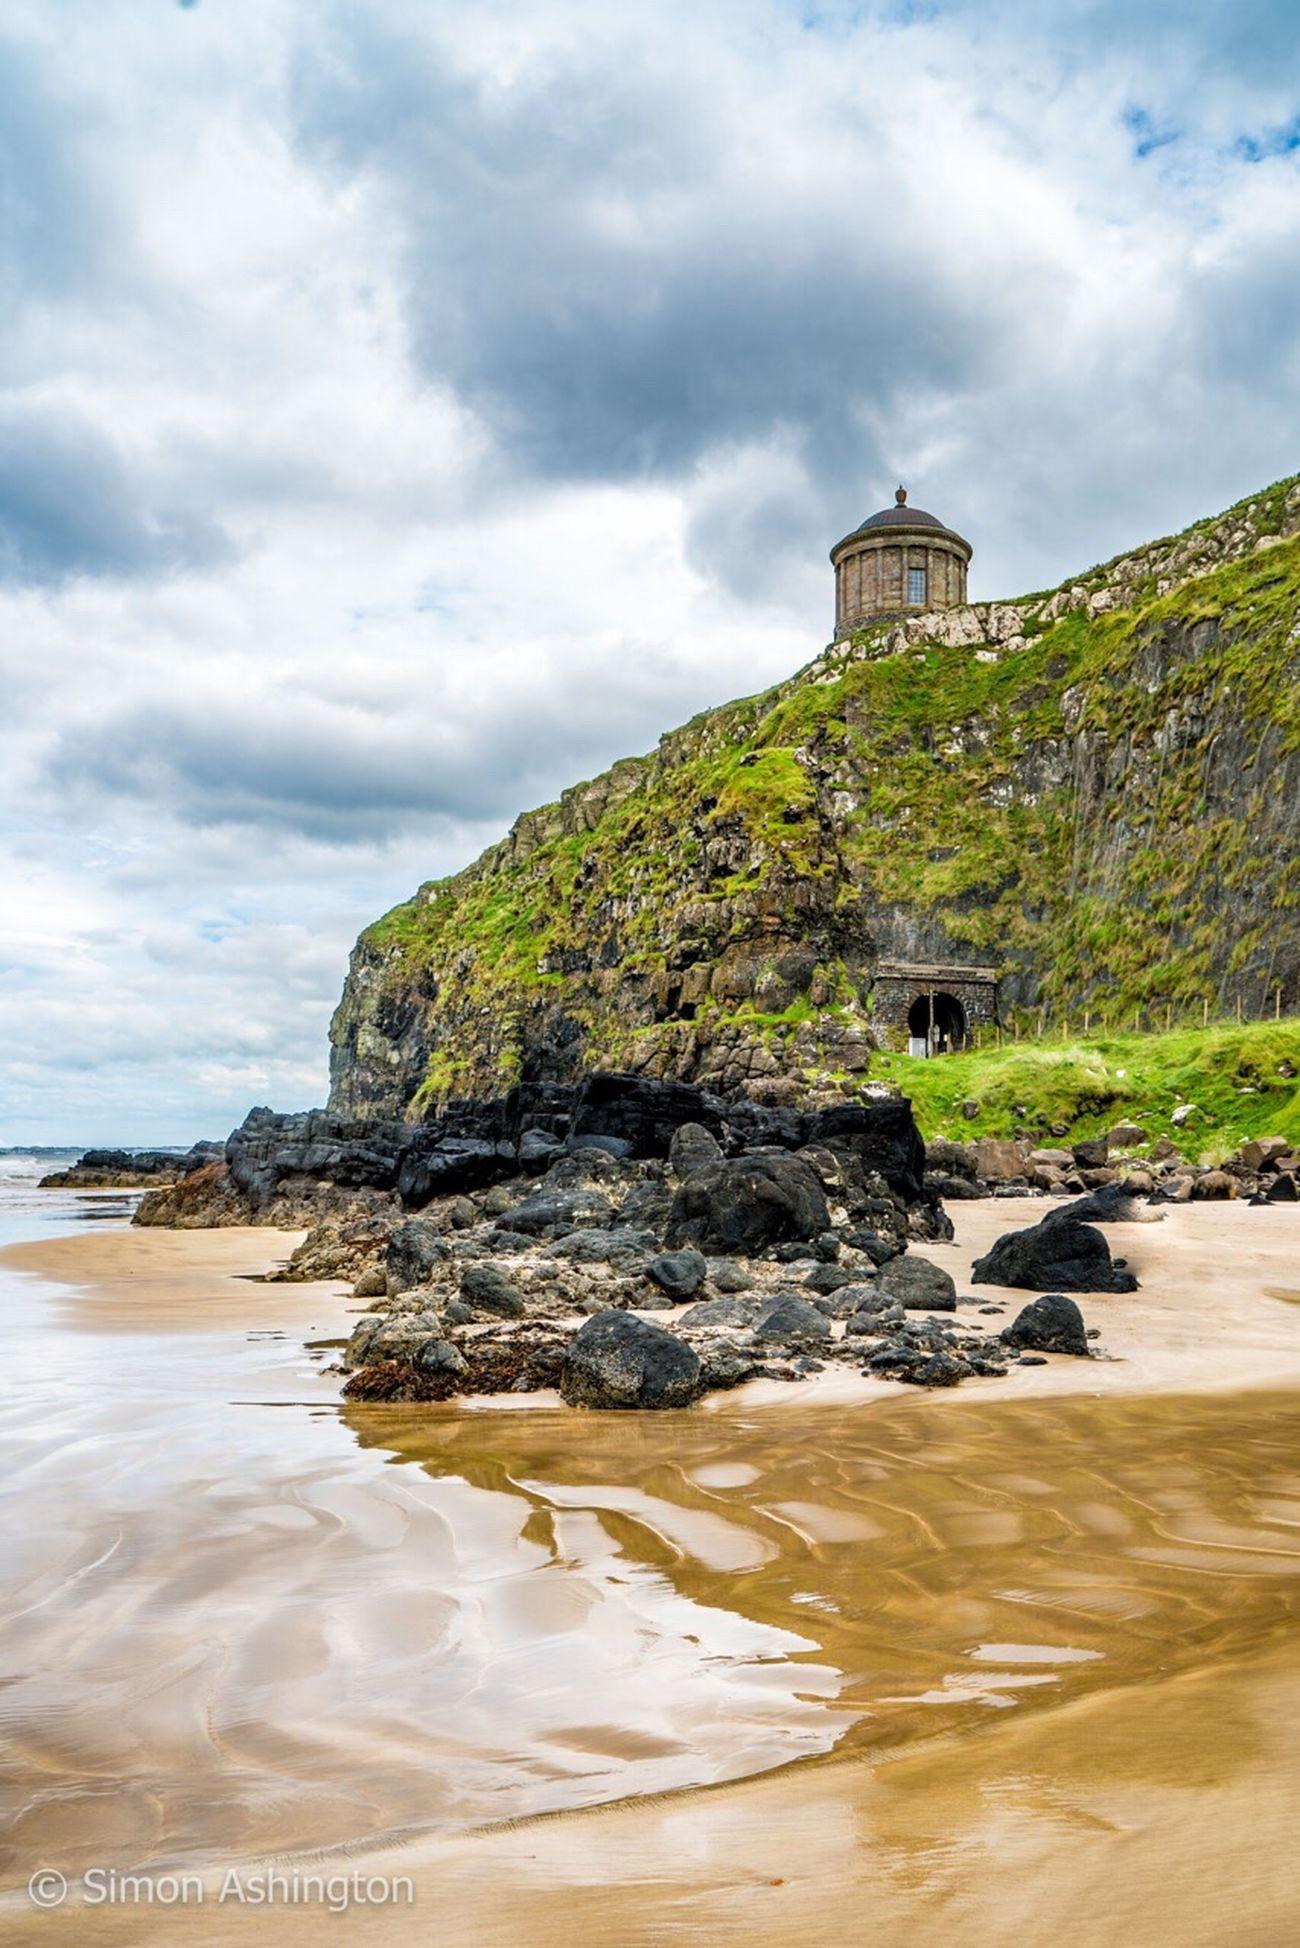 Beach Northern Ireland Northernireland Mussenden Temple Sea Photography Photo Taking Photos